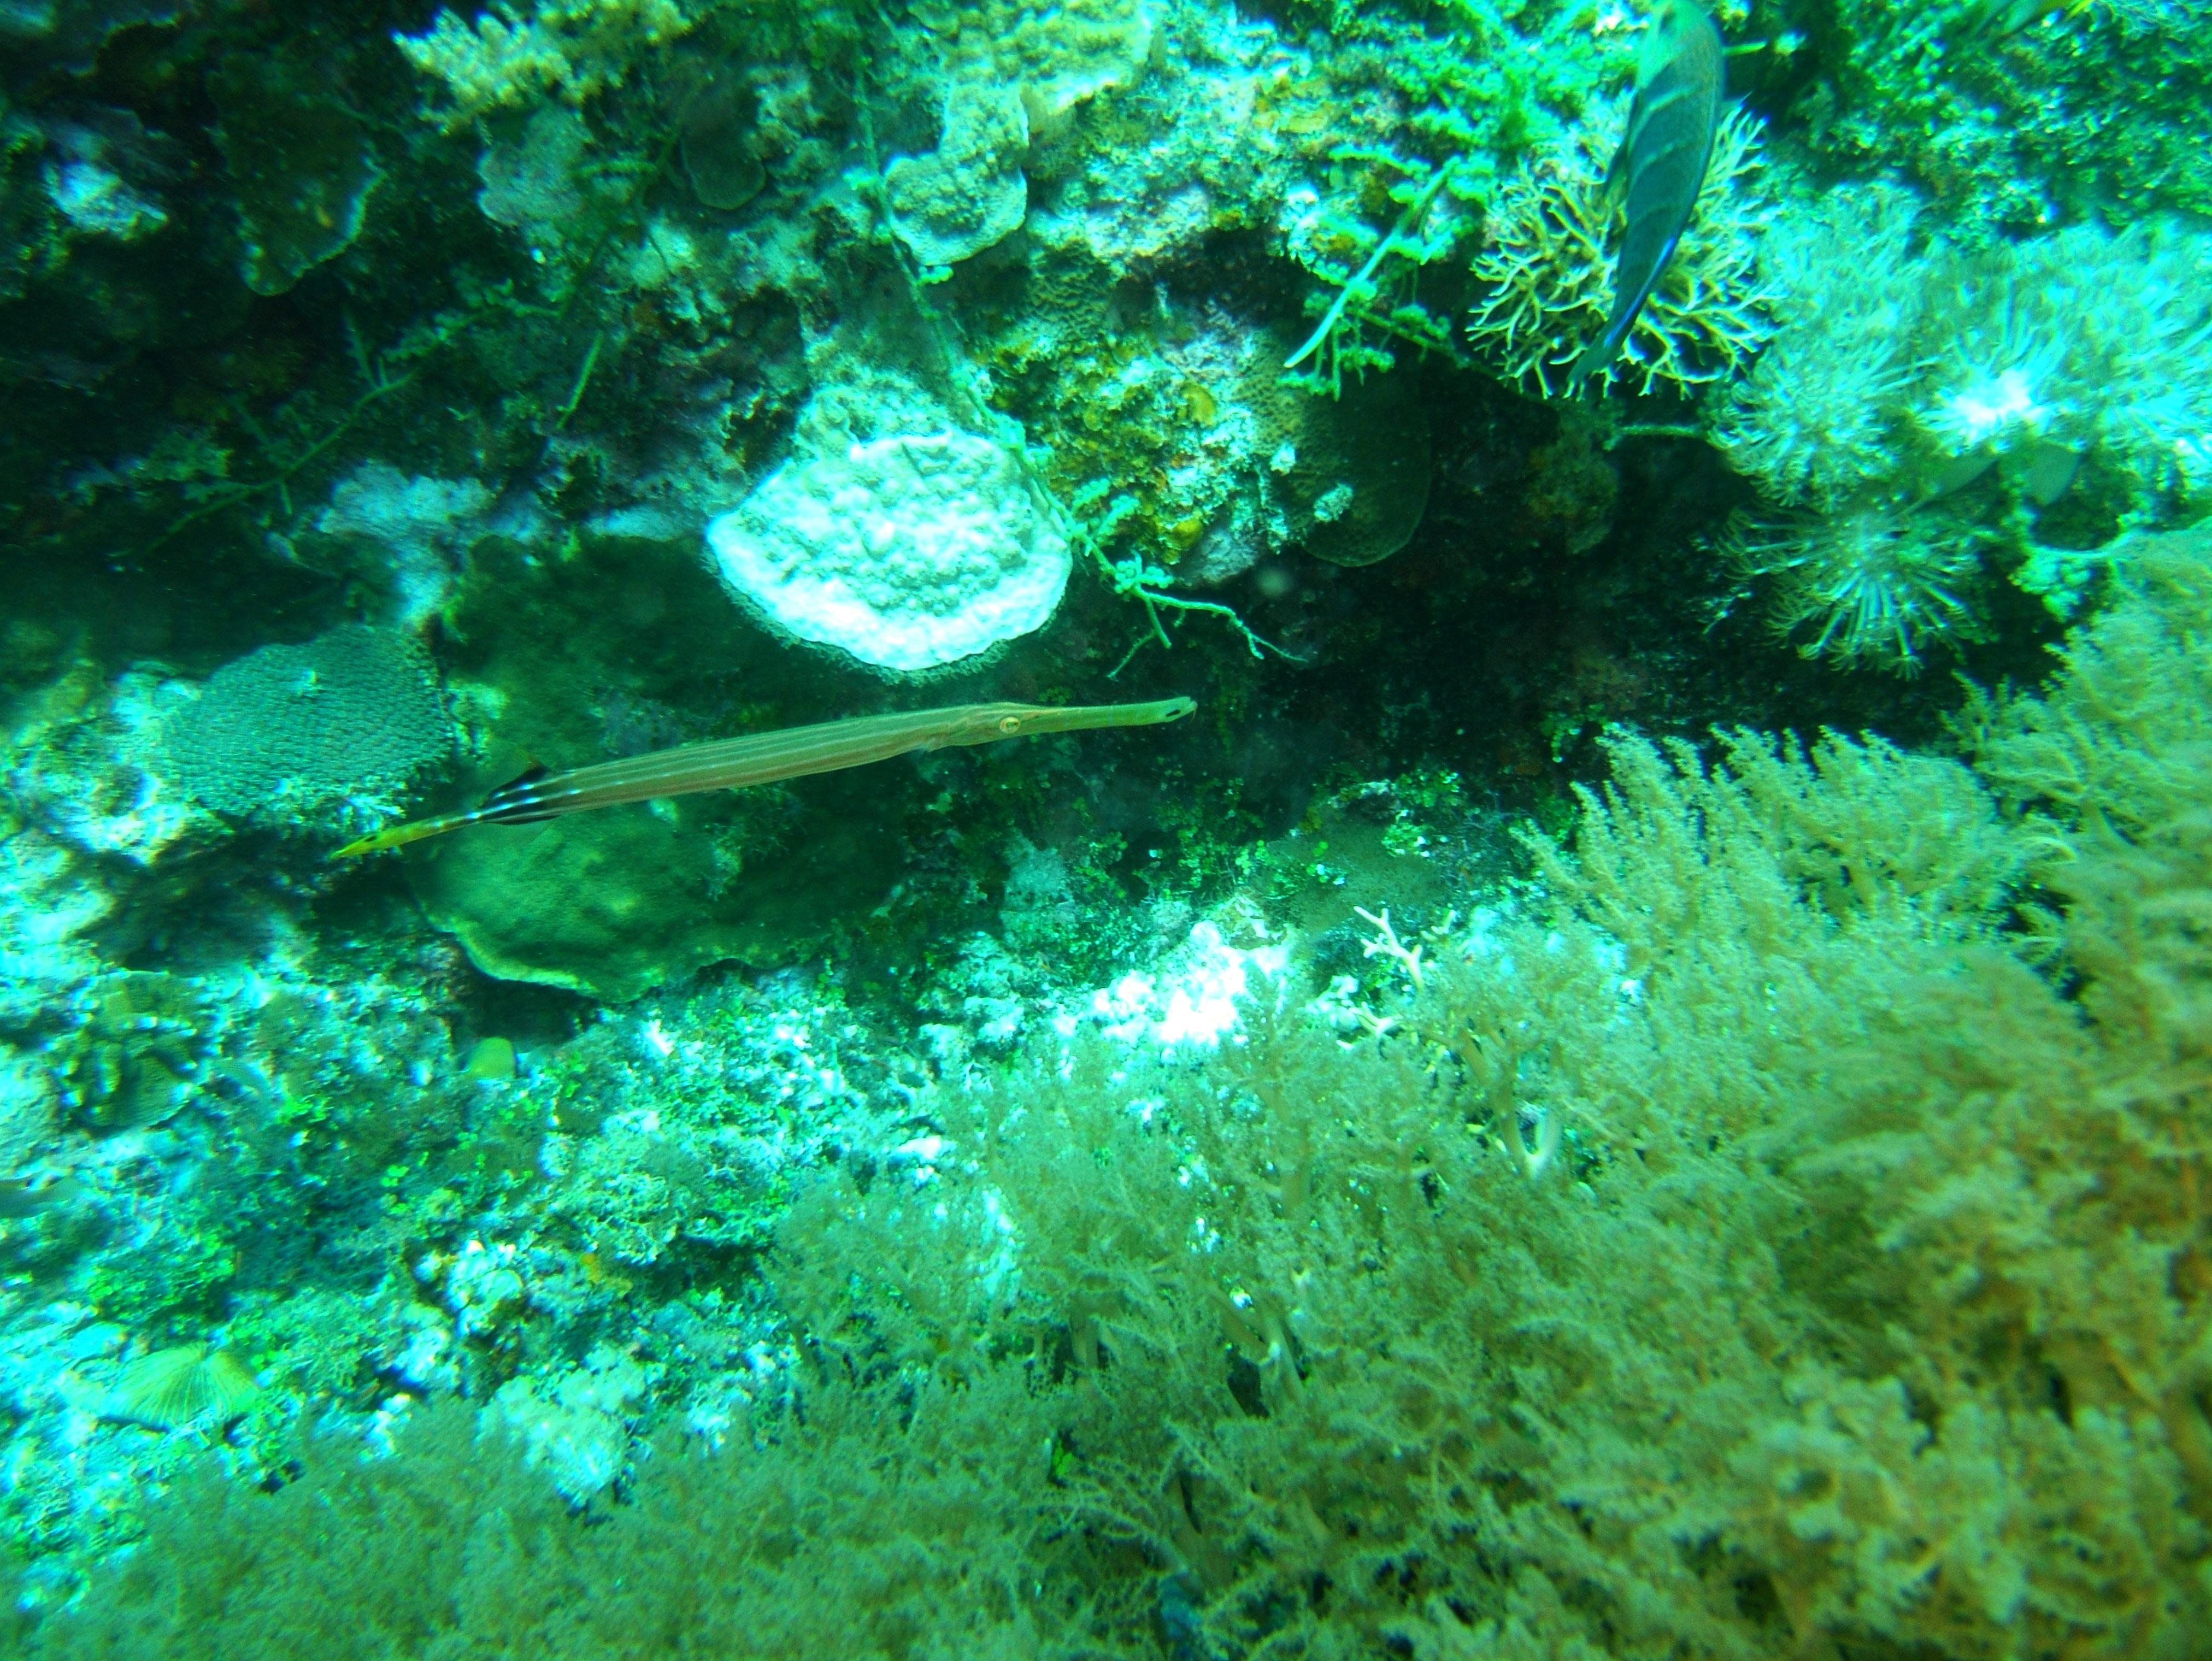 Philippines Cebu Bohol Balicasag Island Black Forest dive Dec 2005 23